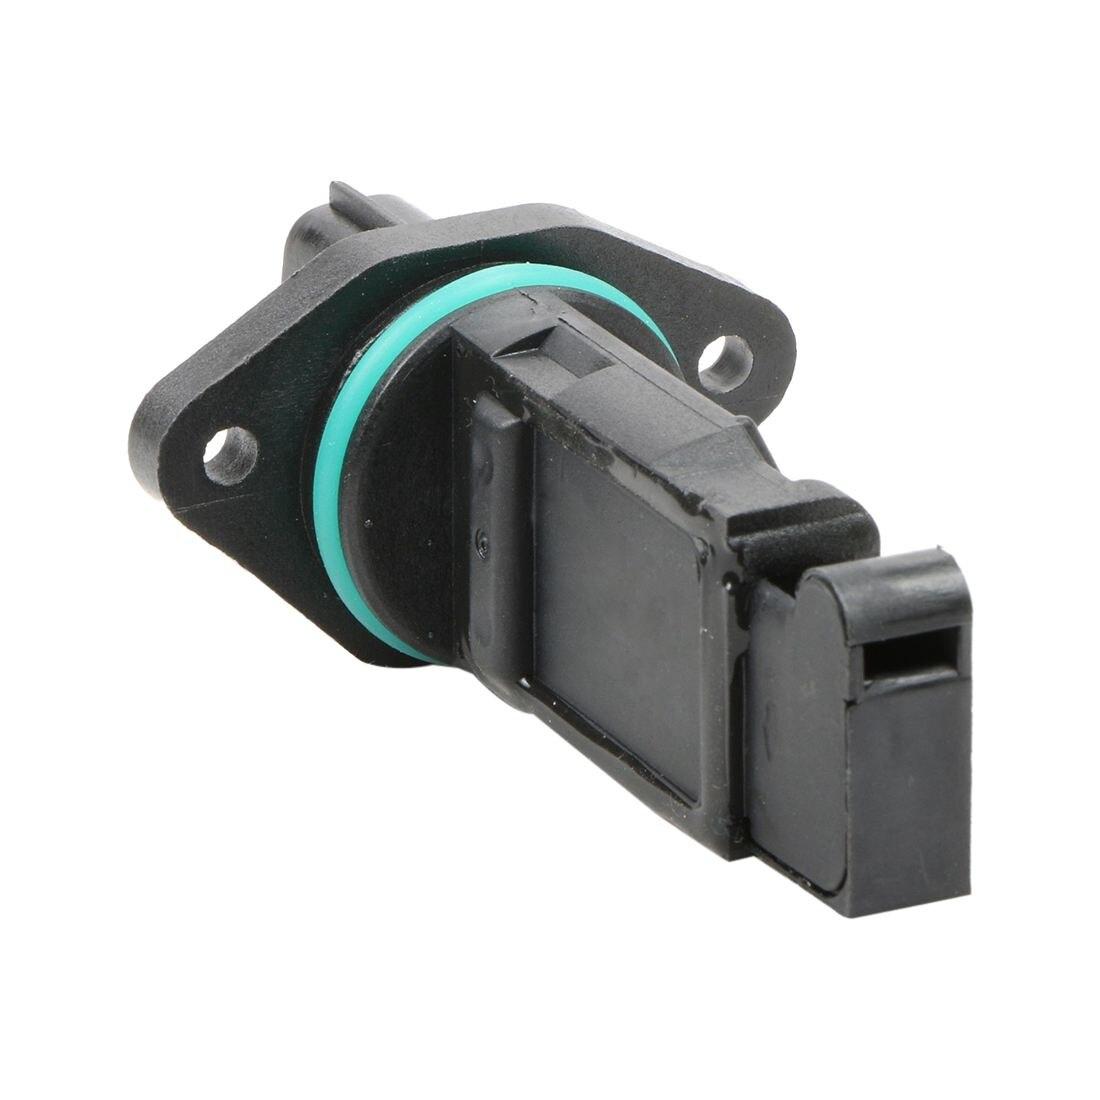 High Quality Maf Mass Air Flow Meter Sensor Fit G20 I30 Maxima Sentra 226804M500 22680AD200  цены